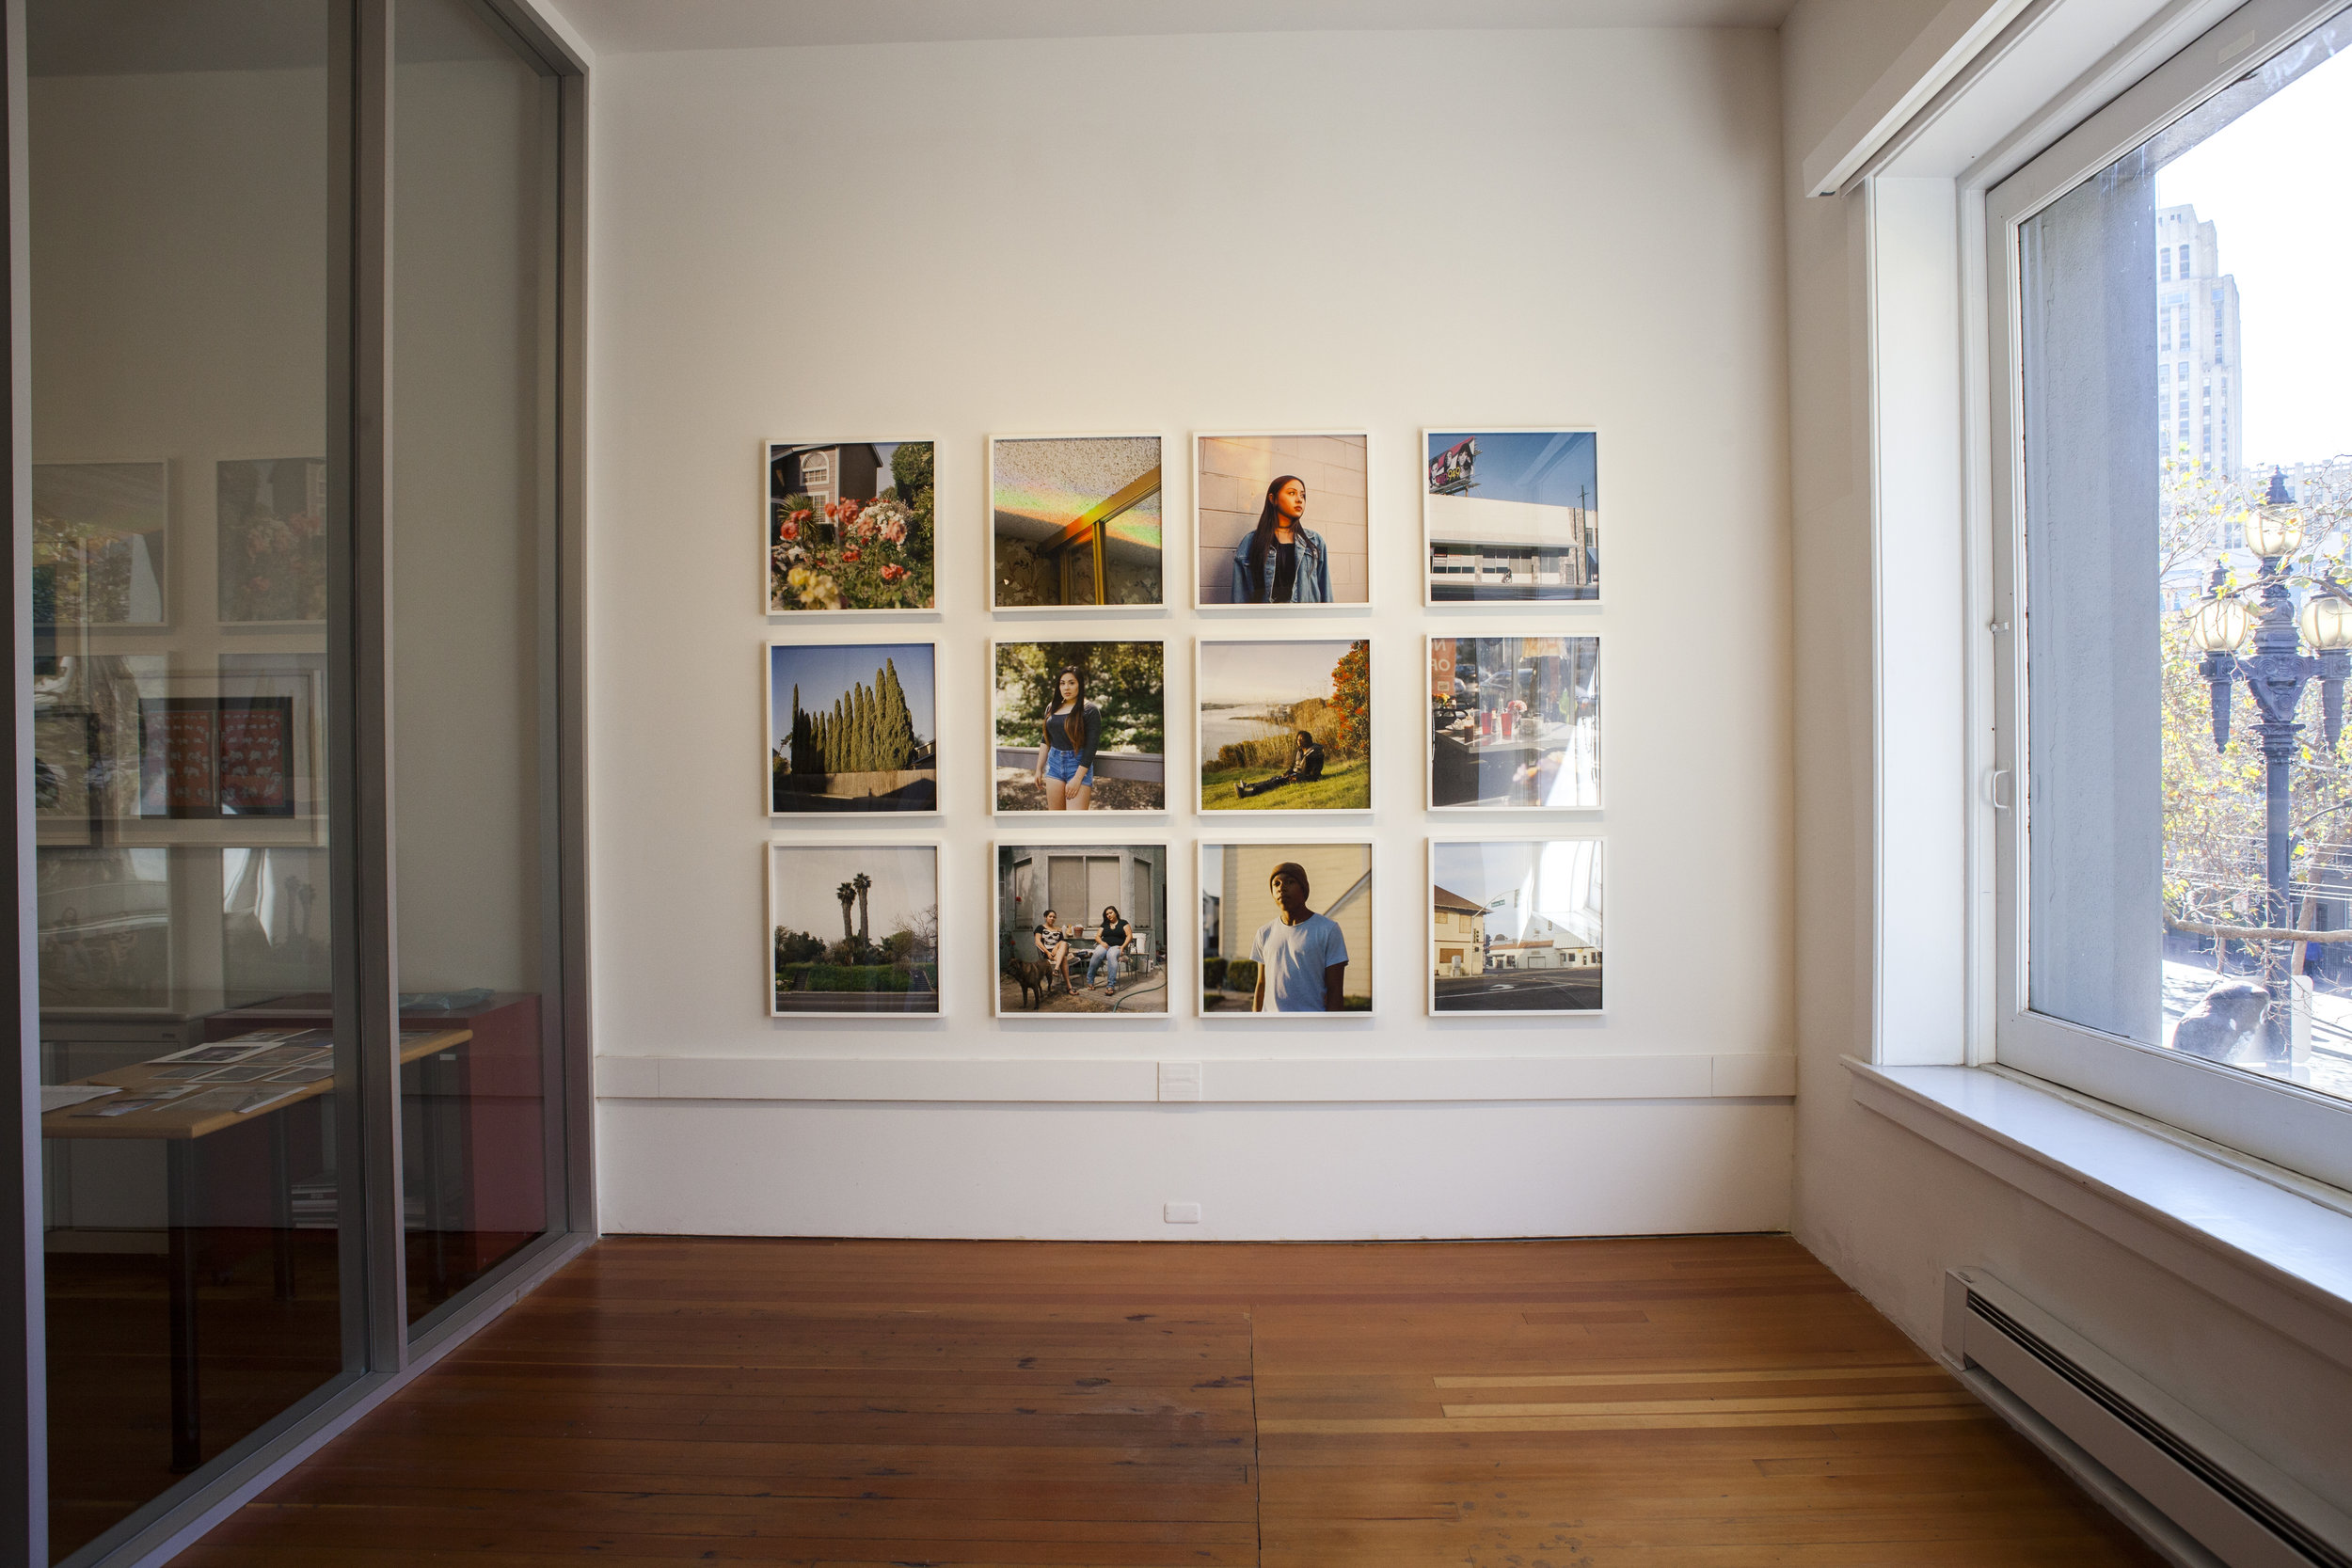 Installation shot of Amanda Boe's work.